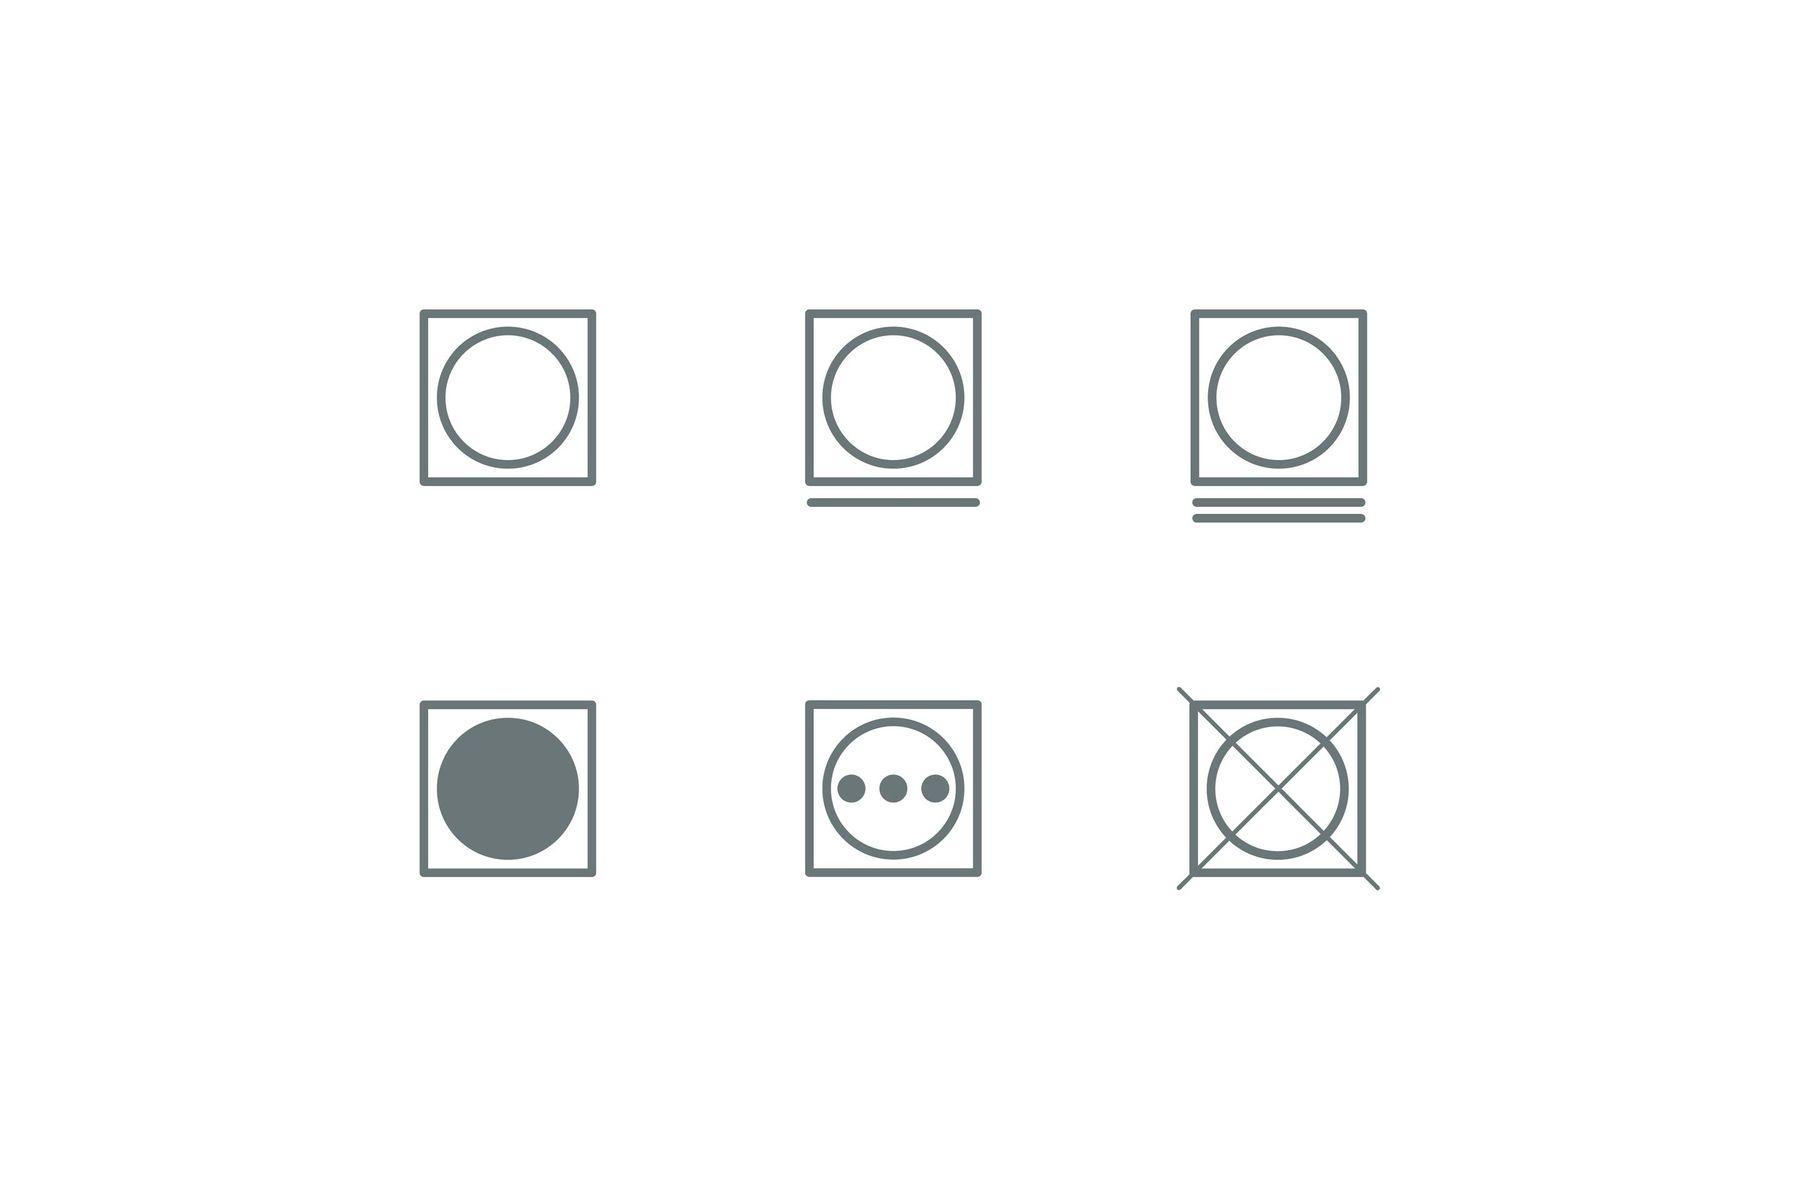 Tumble drying symbols